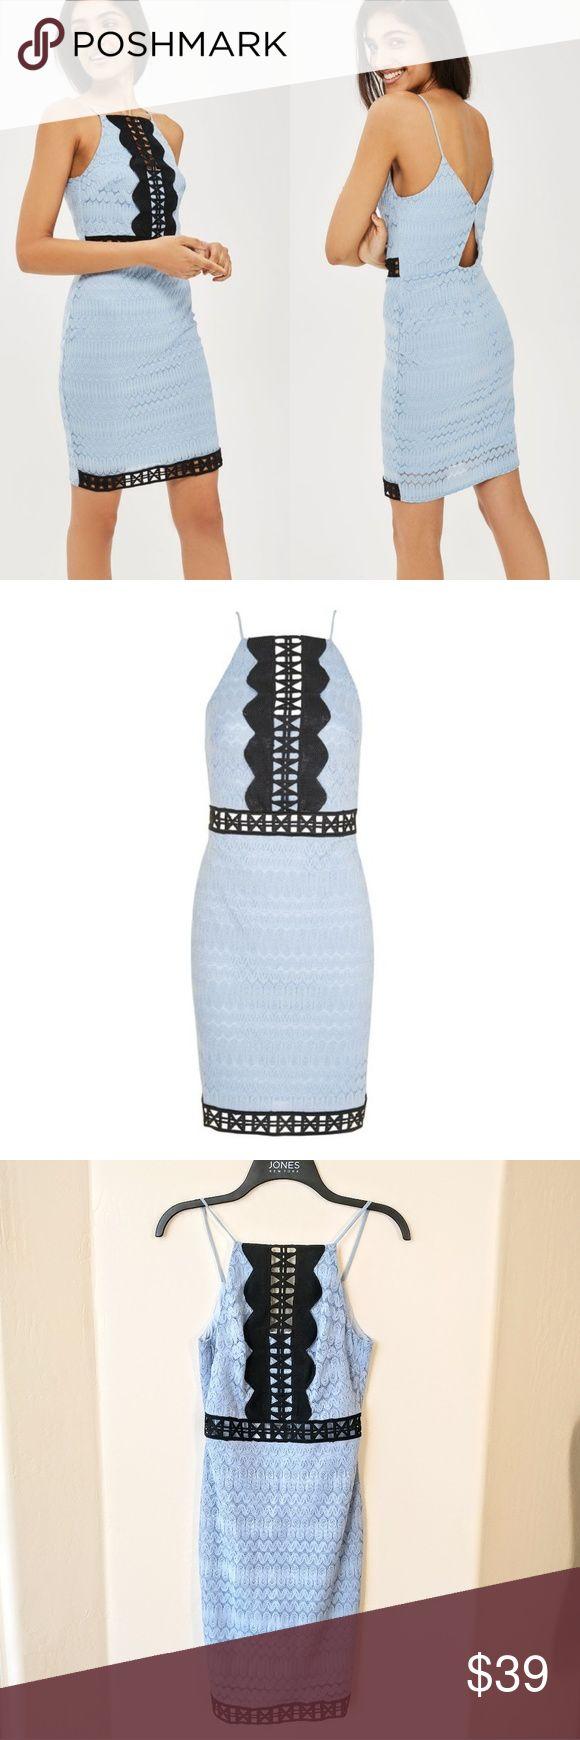 "NWOT Topshop TALL Crochet Lace Bodycon Dress TALL Crochet lace bodycon dress.   Condition: new without tag Size: 4 Bust flat 15.5"" Waist flat 13.5"" Length 37.5""  90% Nylon, 10% Elastane.  Machine wash Topshop Dresses Mini"